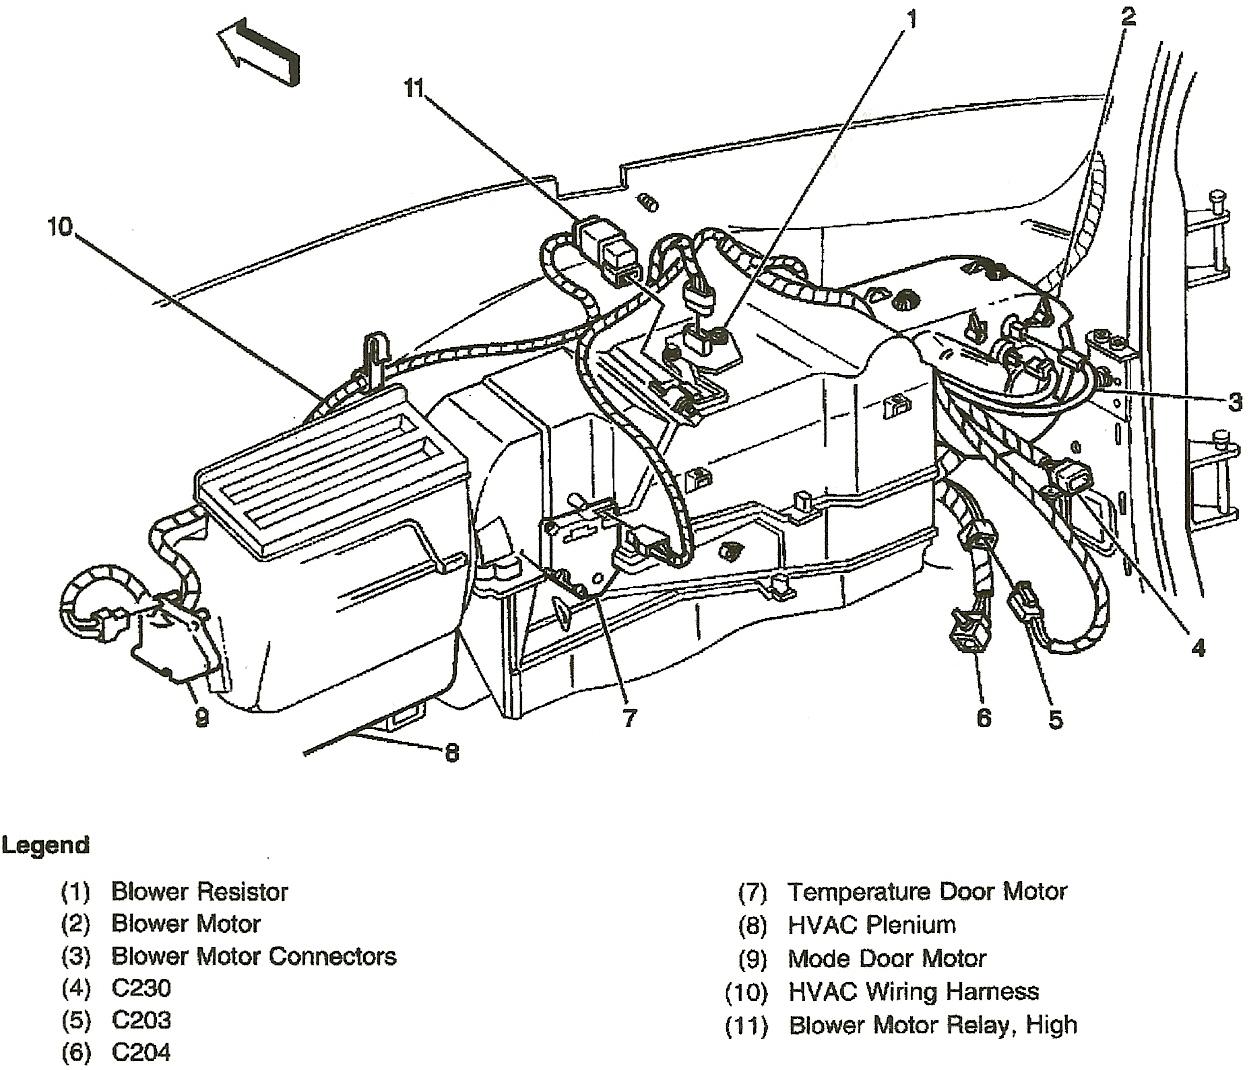 Fantastic 2007 Chevy Suburban Fuse Diagram Basic Electronics Wiring Diagram Wiring Cloud Overrenstrafr09Org